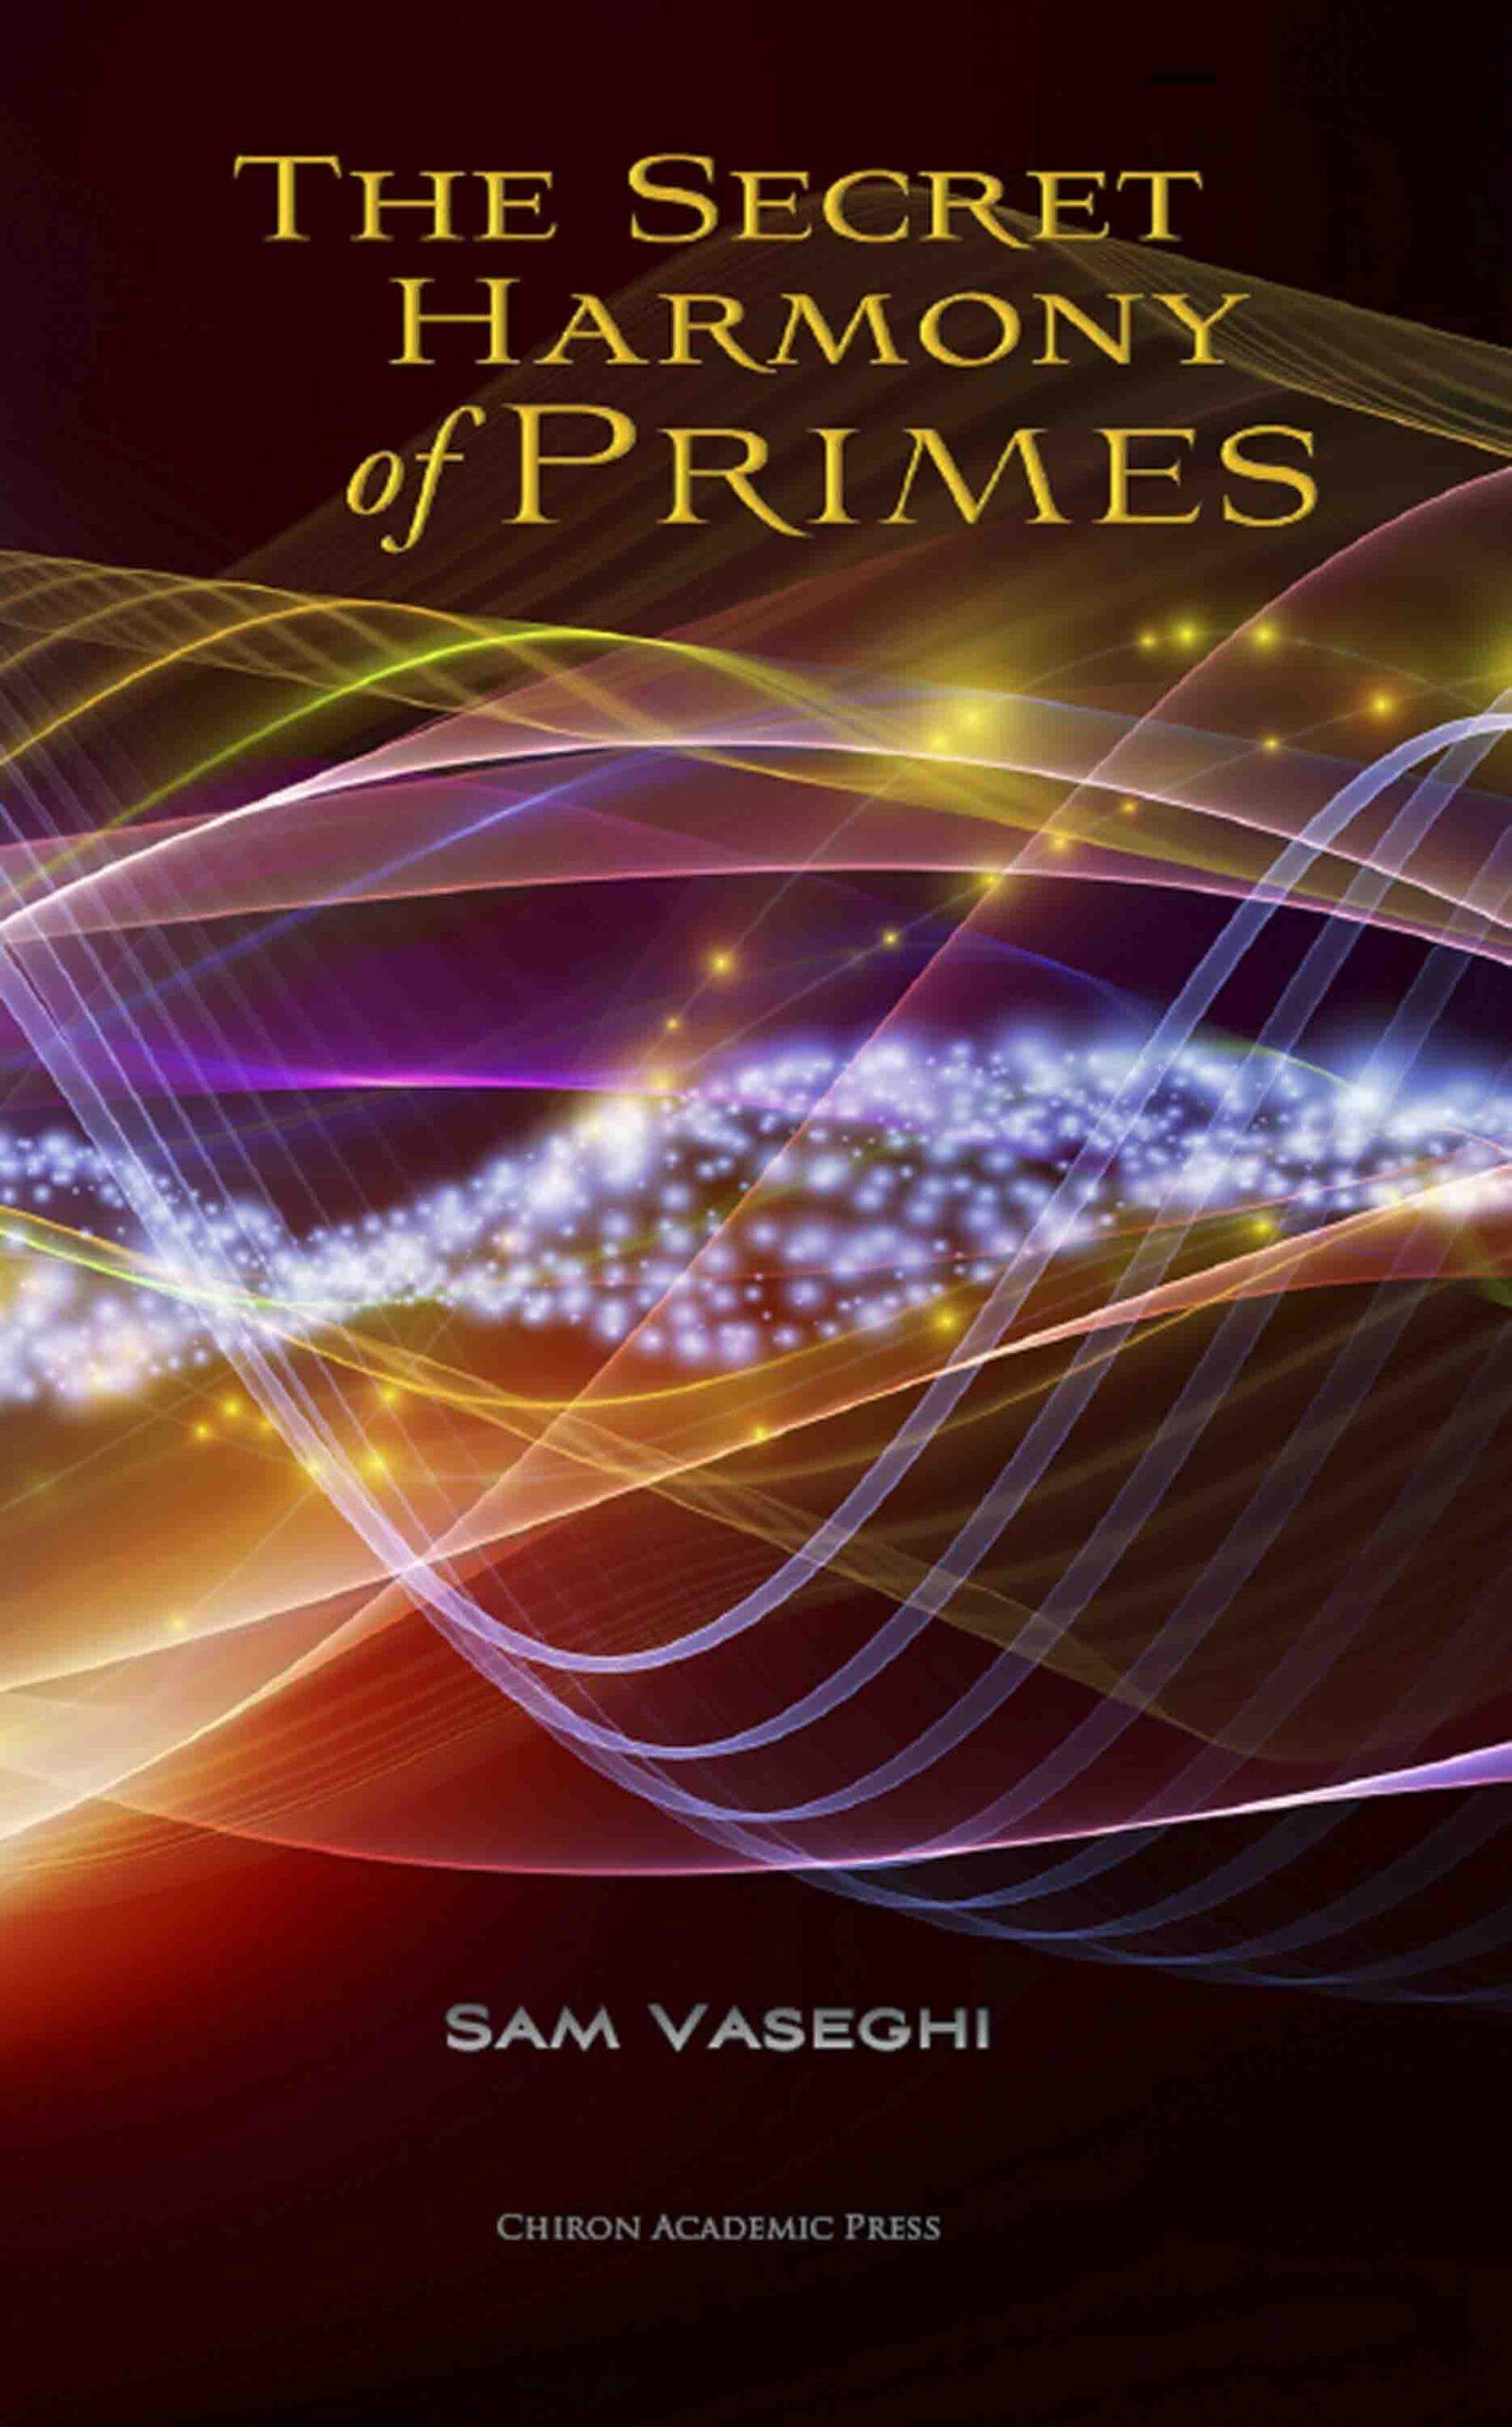 The Secret Harmony of the Primes